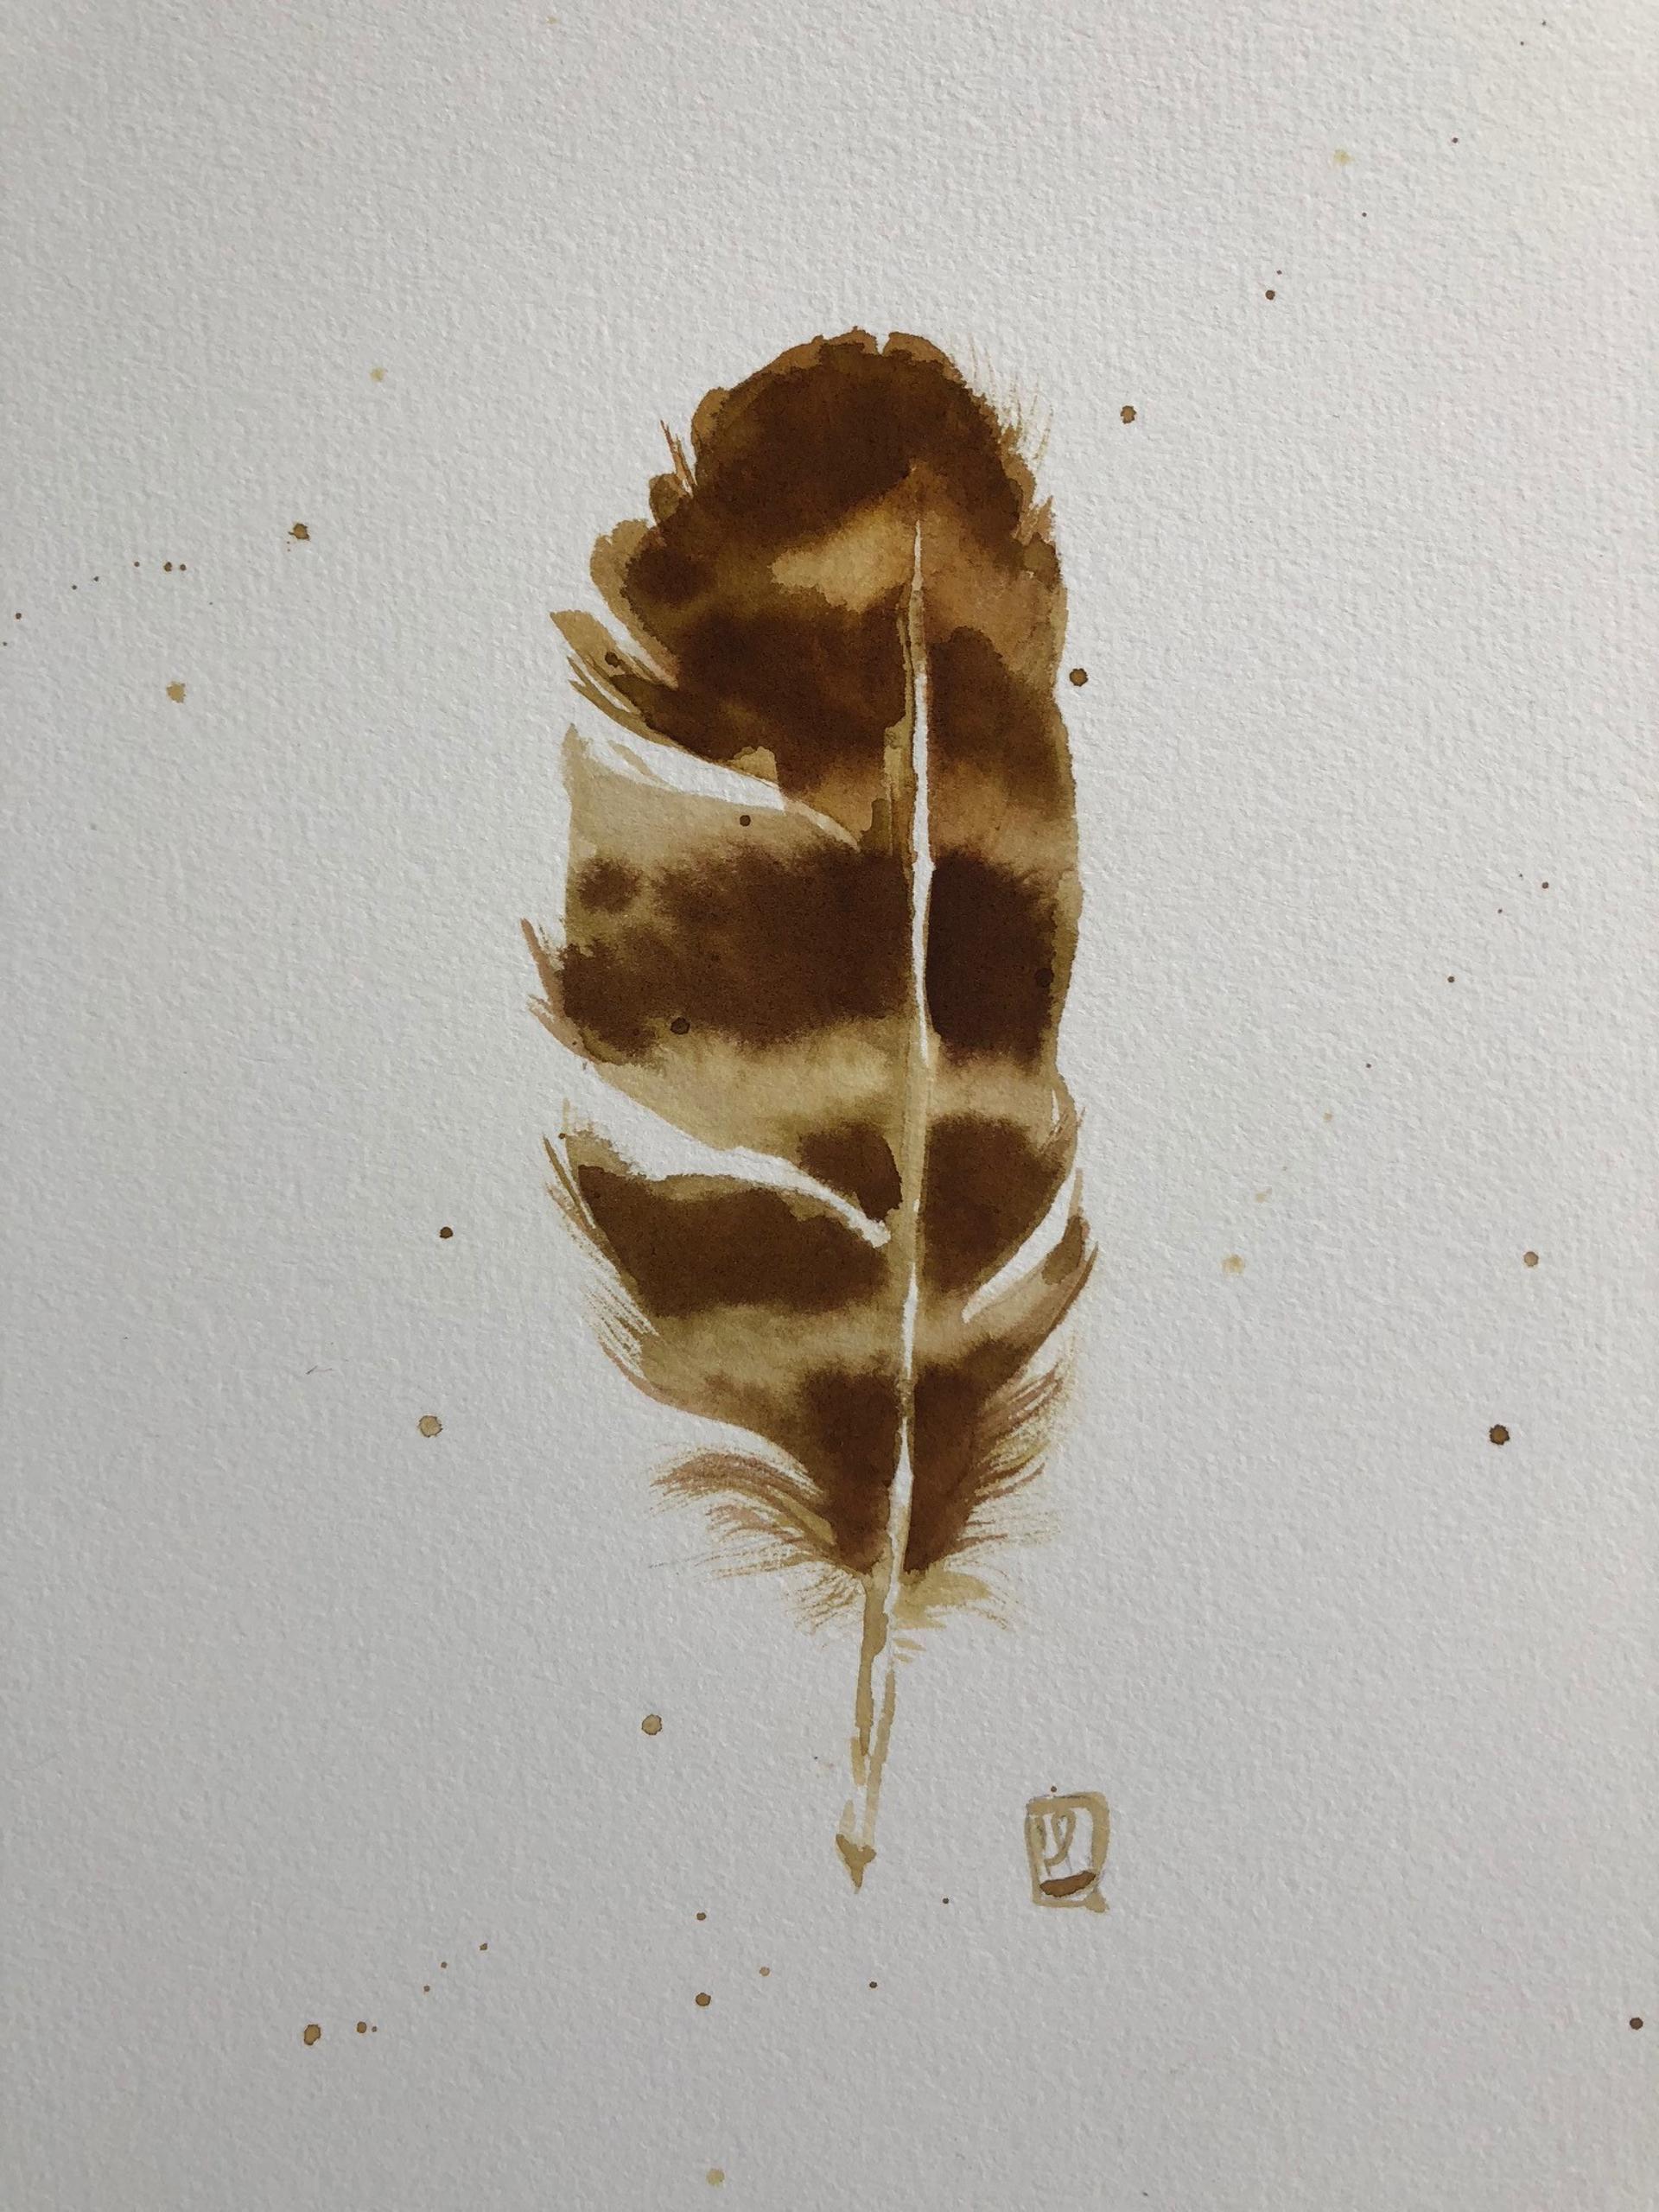 Min Pinion 11 by Laura Roebuck